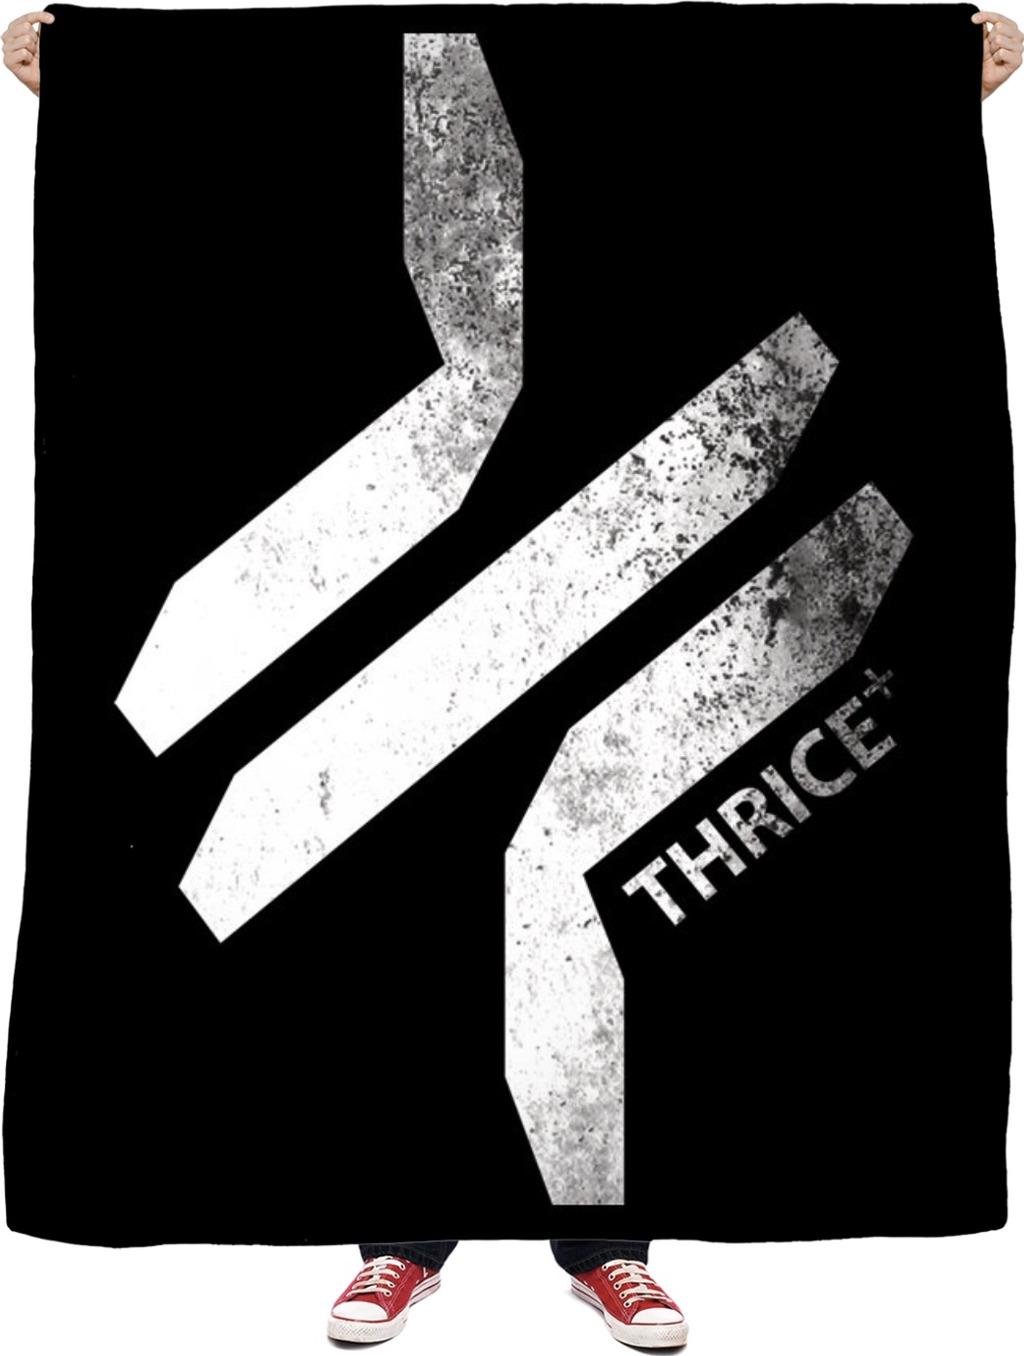 Thrice Logo.